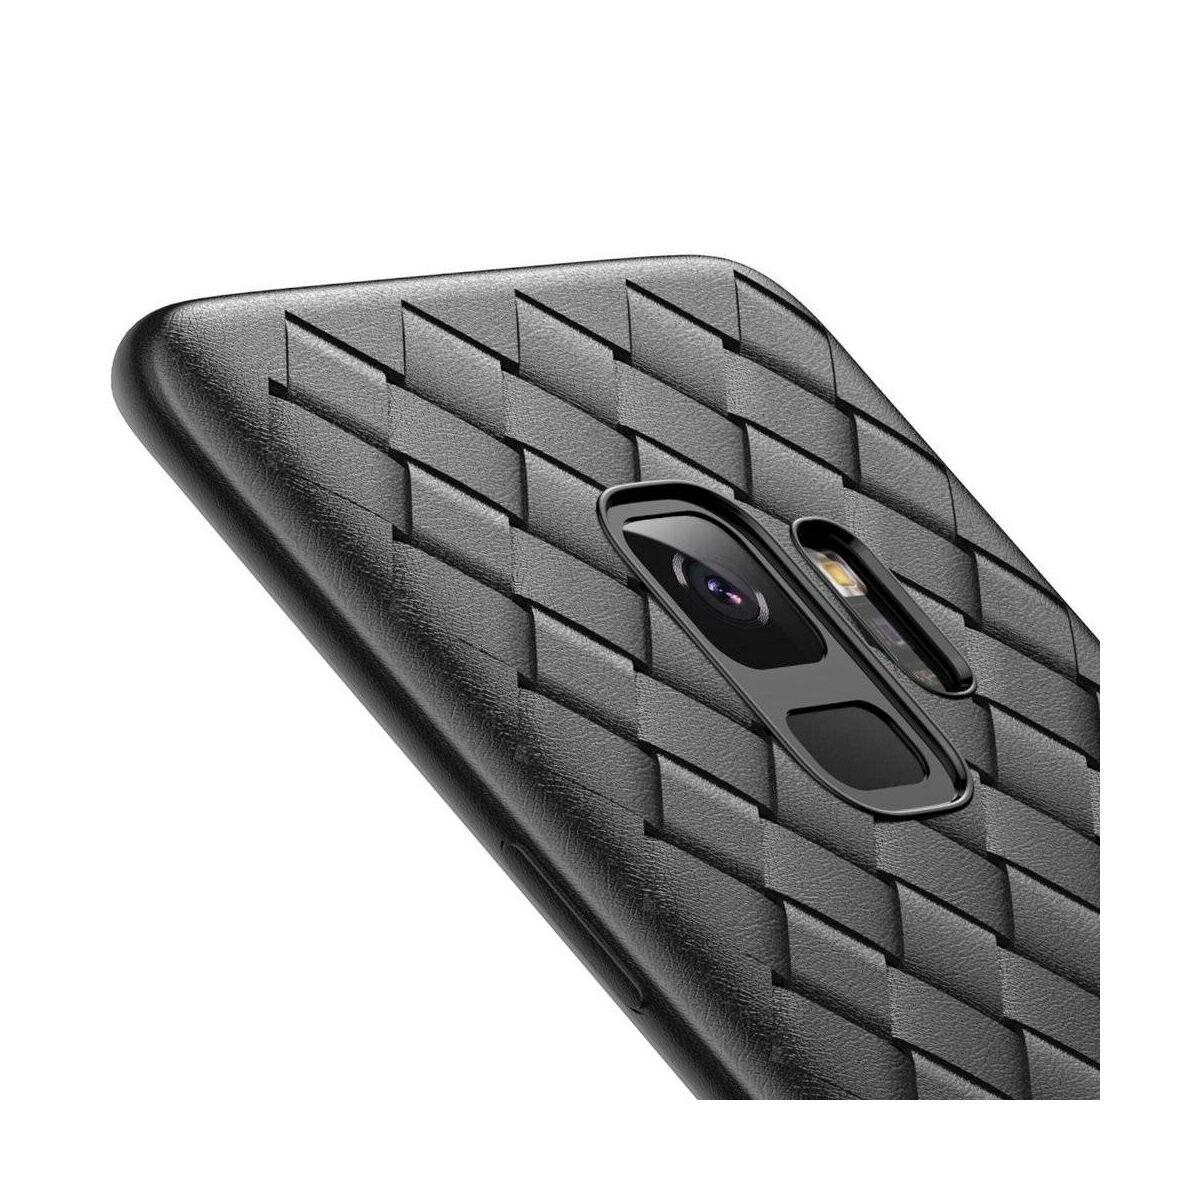 Baseus Samsung S9 tok, BV Weaving, fekete (WISAS9-BV01)